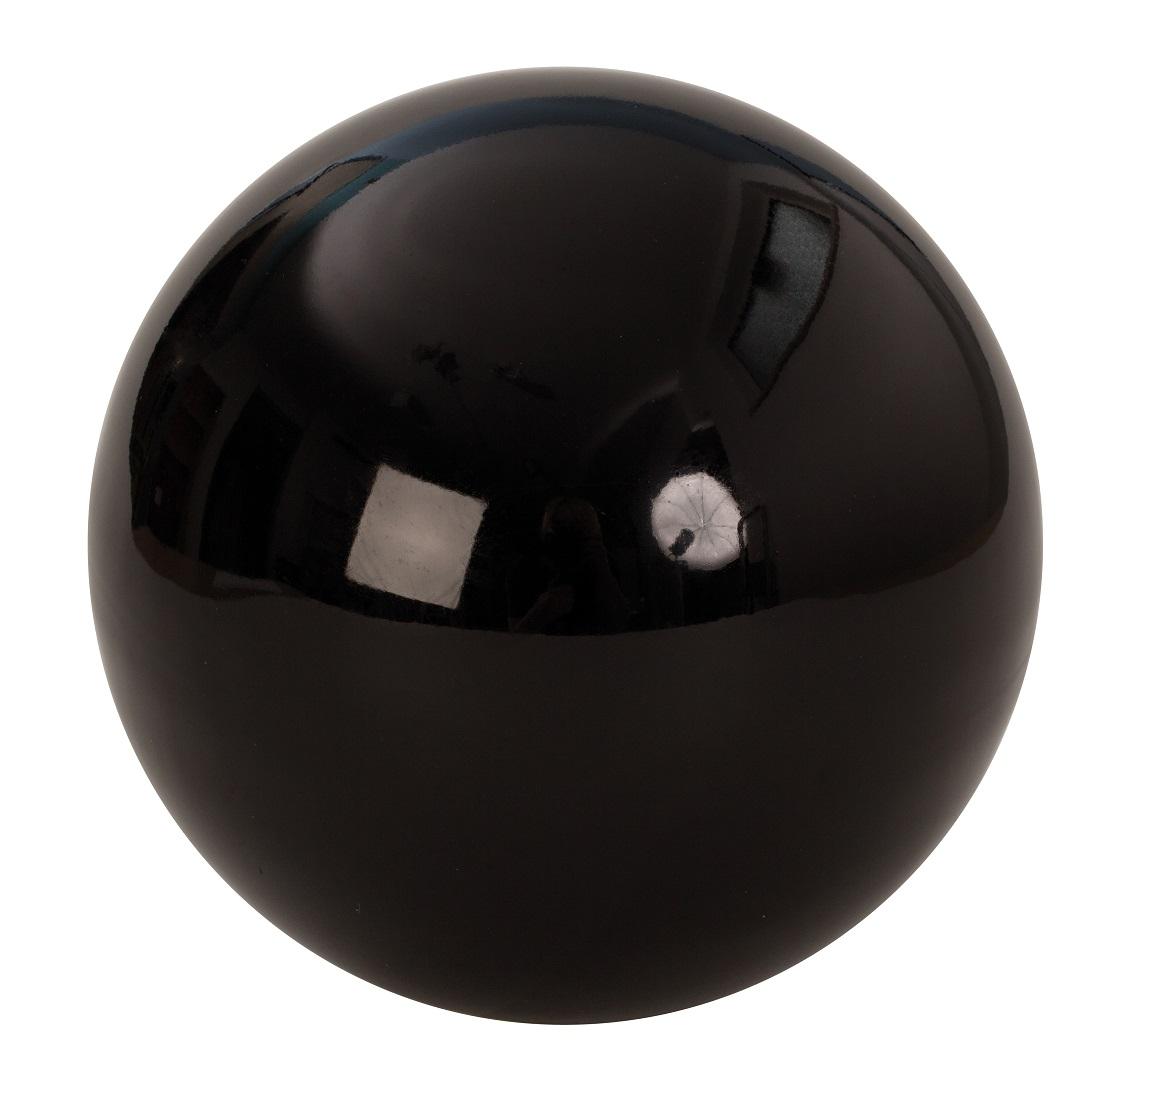 dekokugel aus edelstahl ca 15cm gro schwarz kugel garten weihnachtsdeko ebay. Black Bedroom Furniture Sets. Home Design Ideas